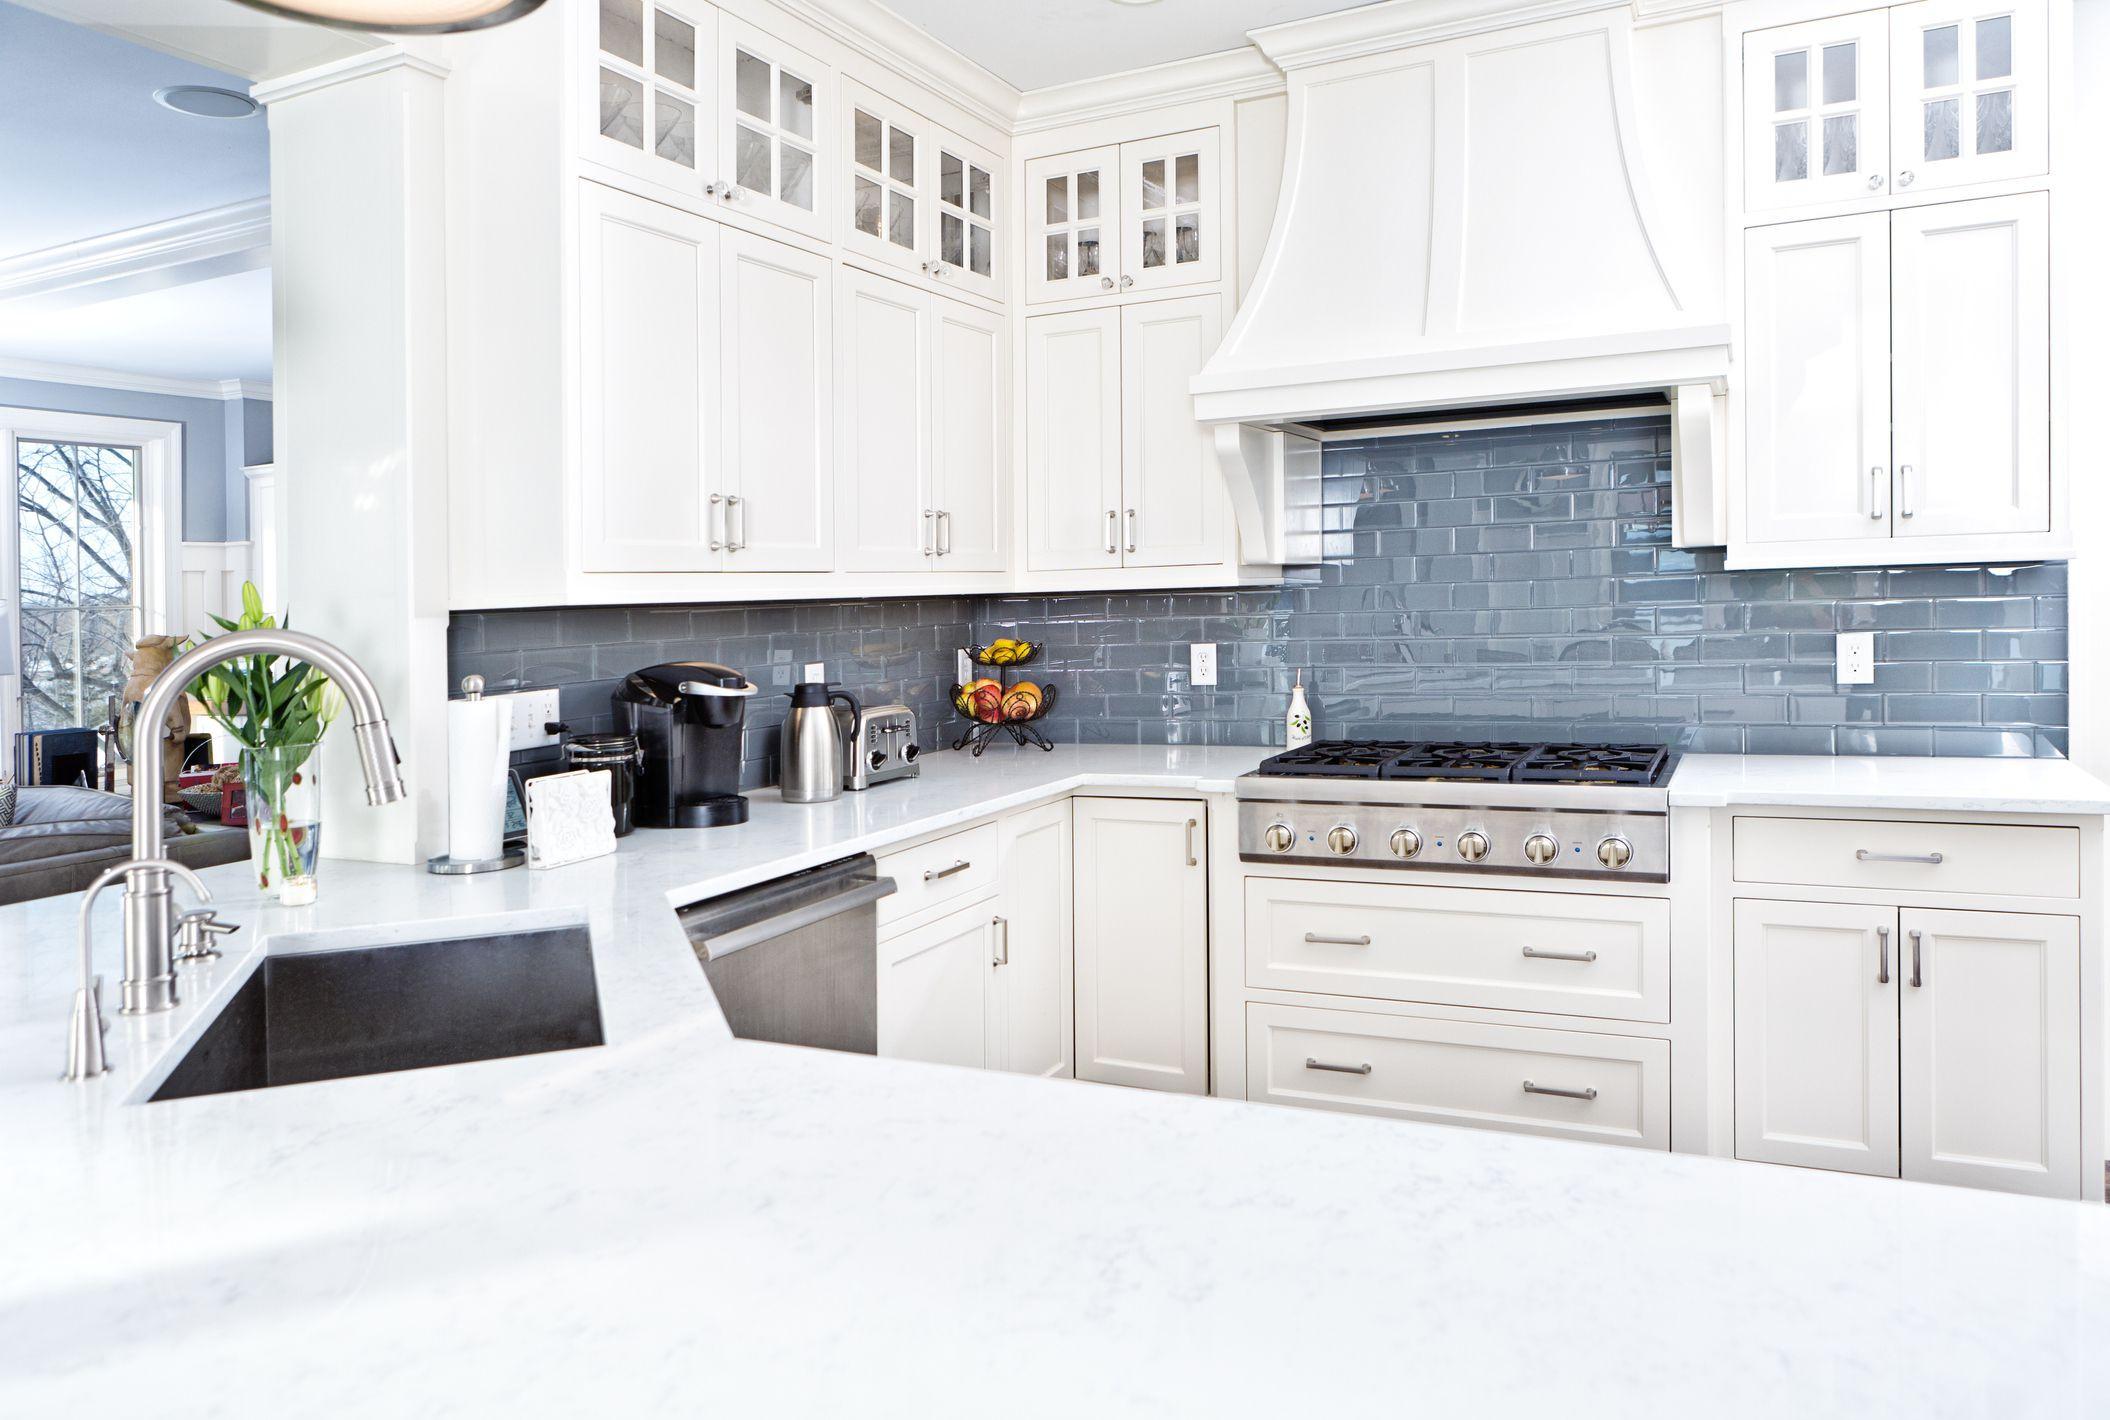 Cost Of Kitchen Backsplash  Tile Ideas for Kitchen Floors and Backsplashes